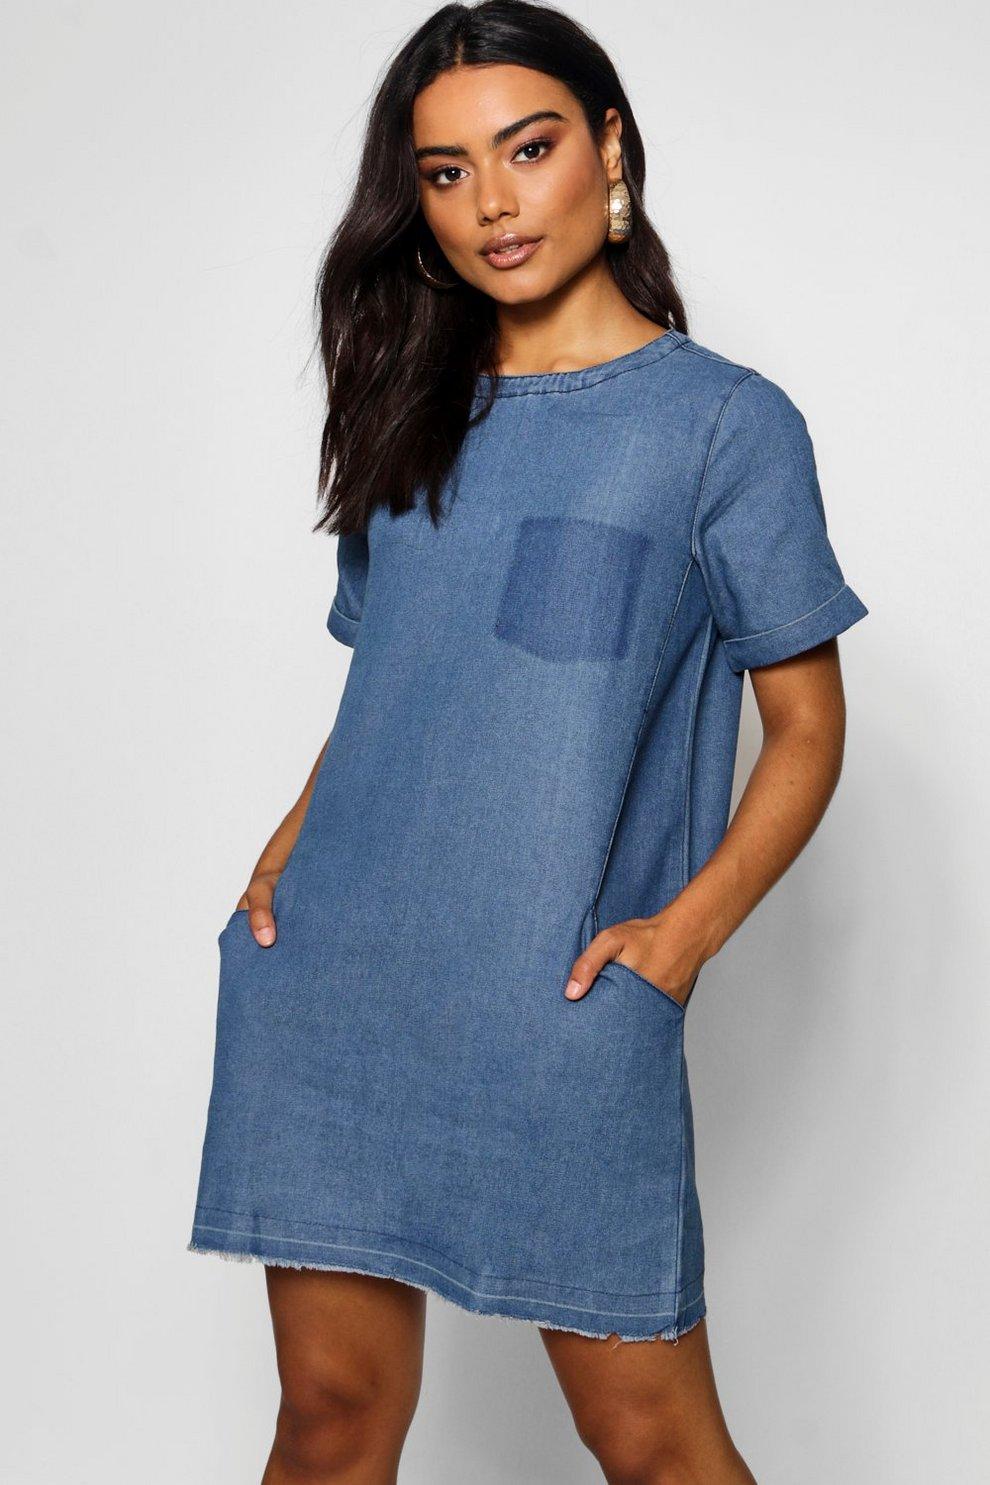 478569d0f2cb6 Womens Mid blue Slouch Pocket Denim Dress